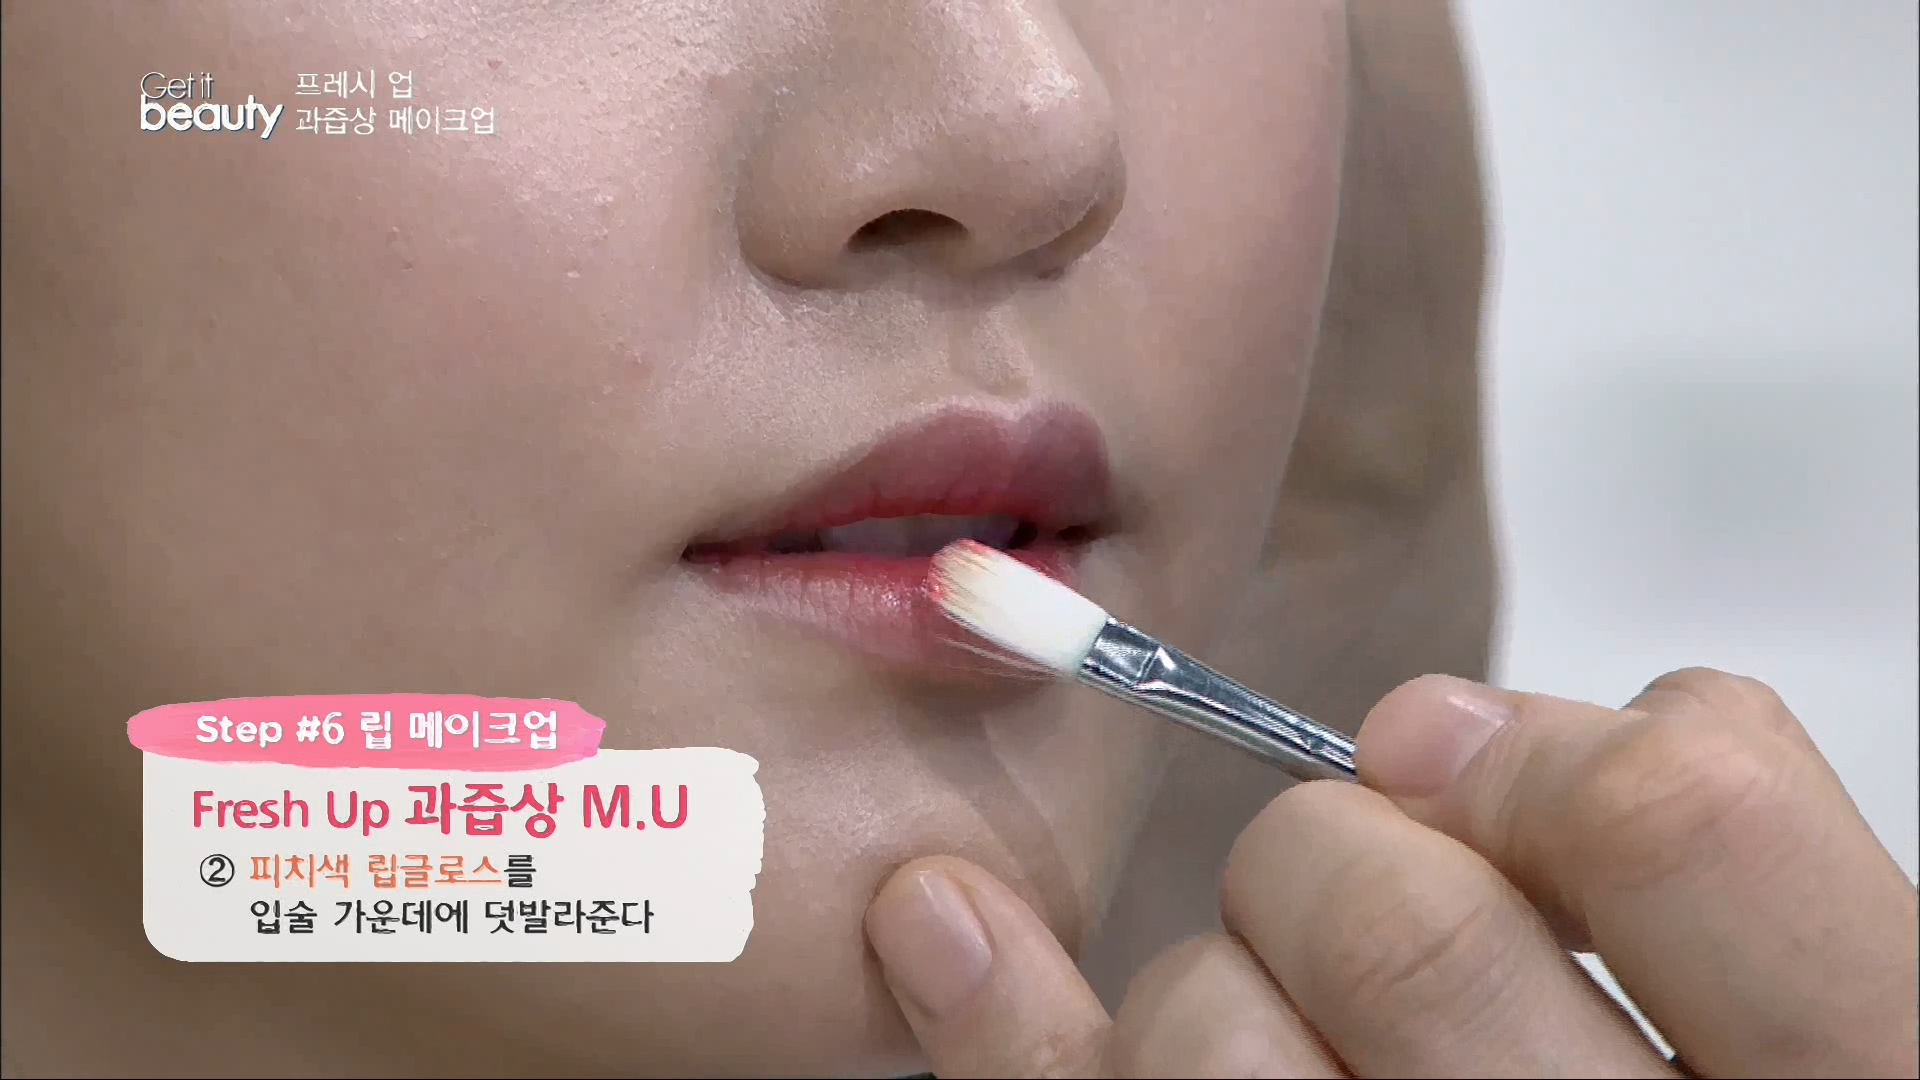 Step#6.립 메이크업 피치색 립글로스를 입술 가운데에 덧발라준다.